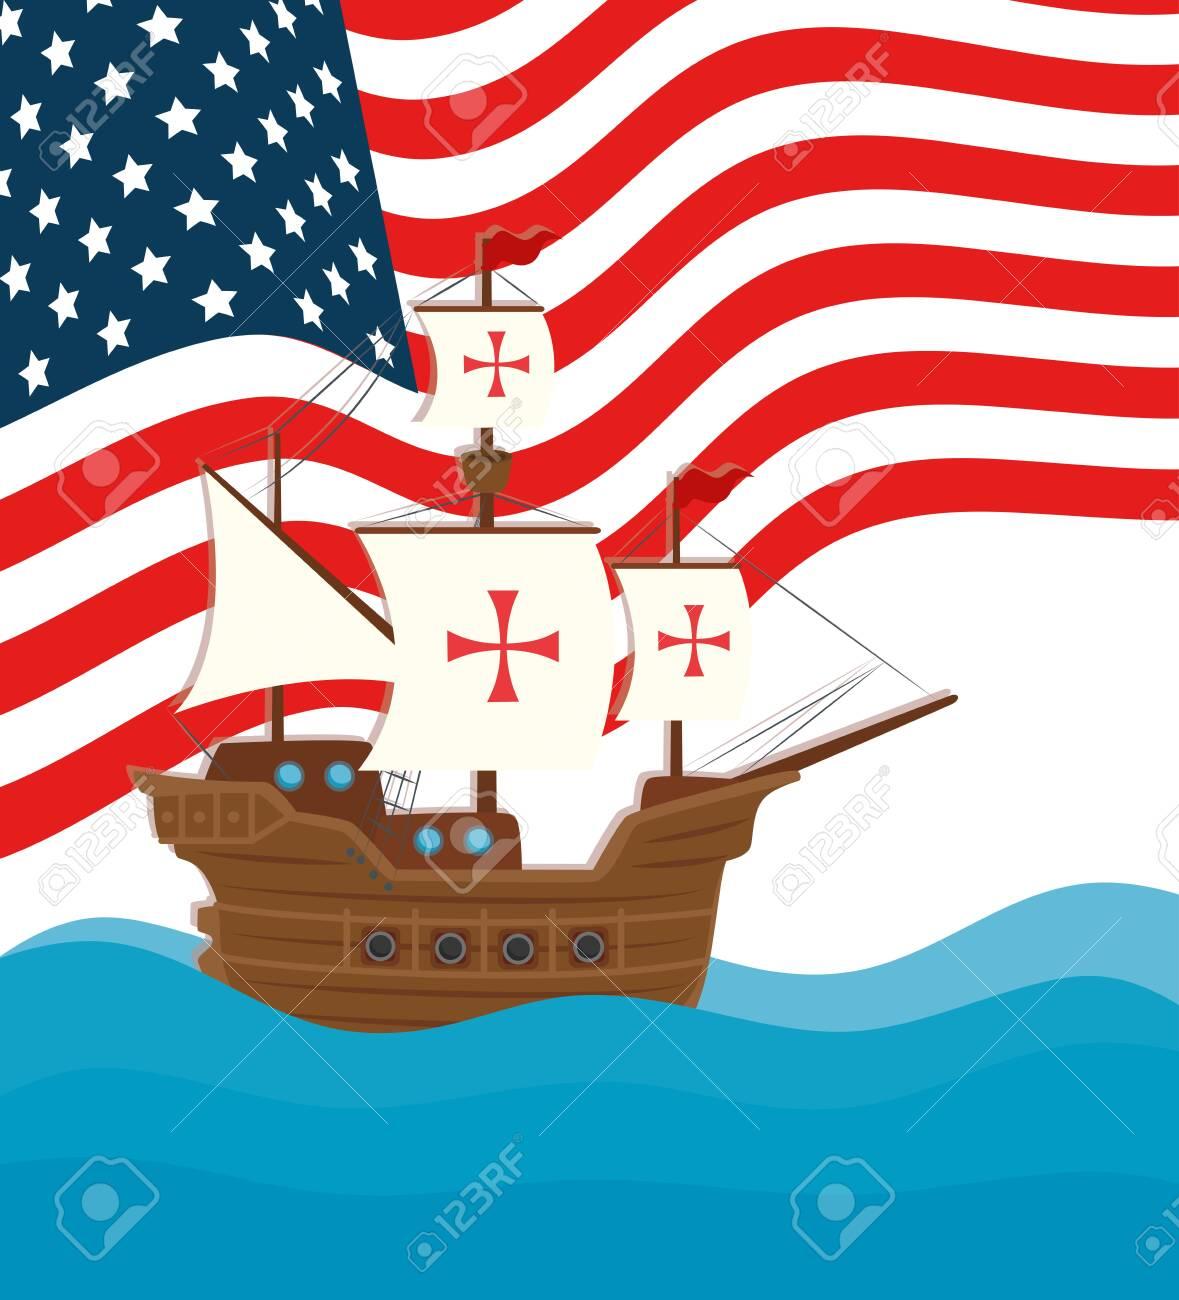 happy columbus day national usa holiday, with ship carabela vector illustration design - 154057292